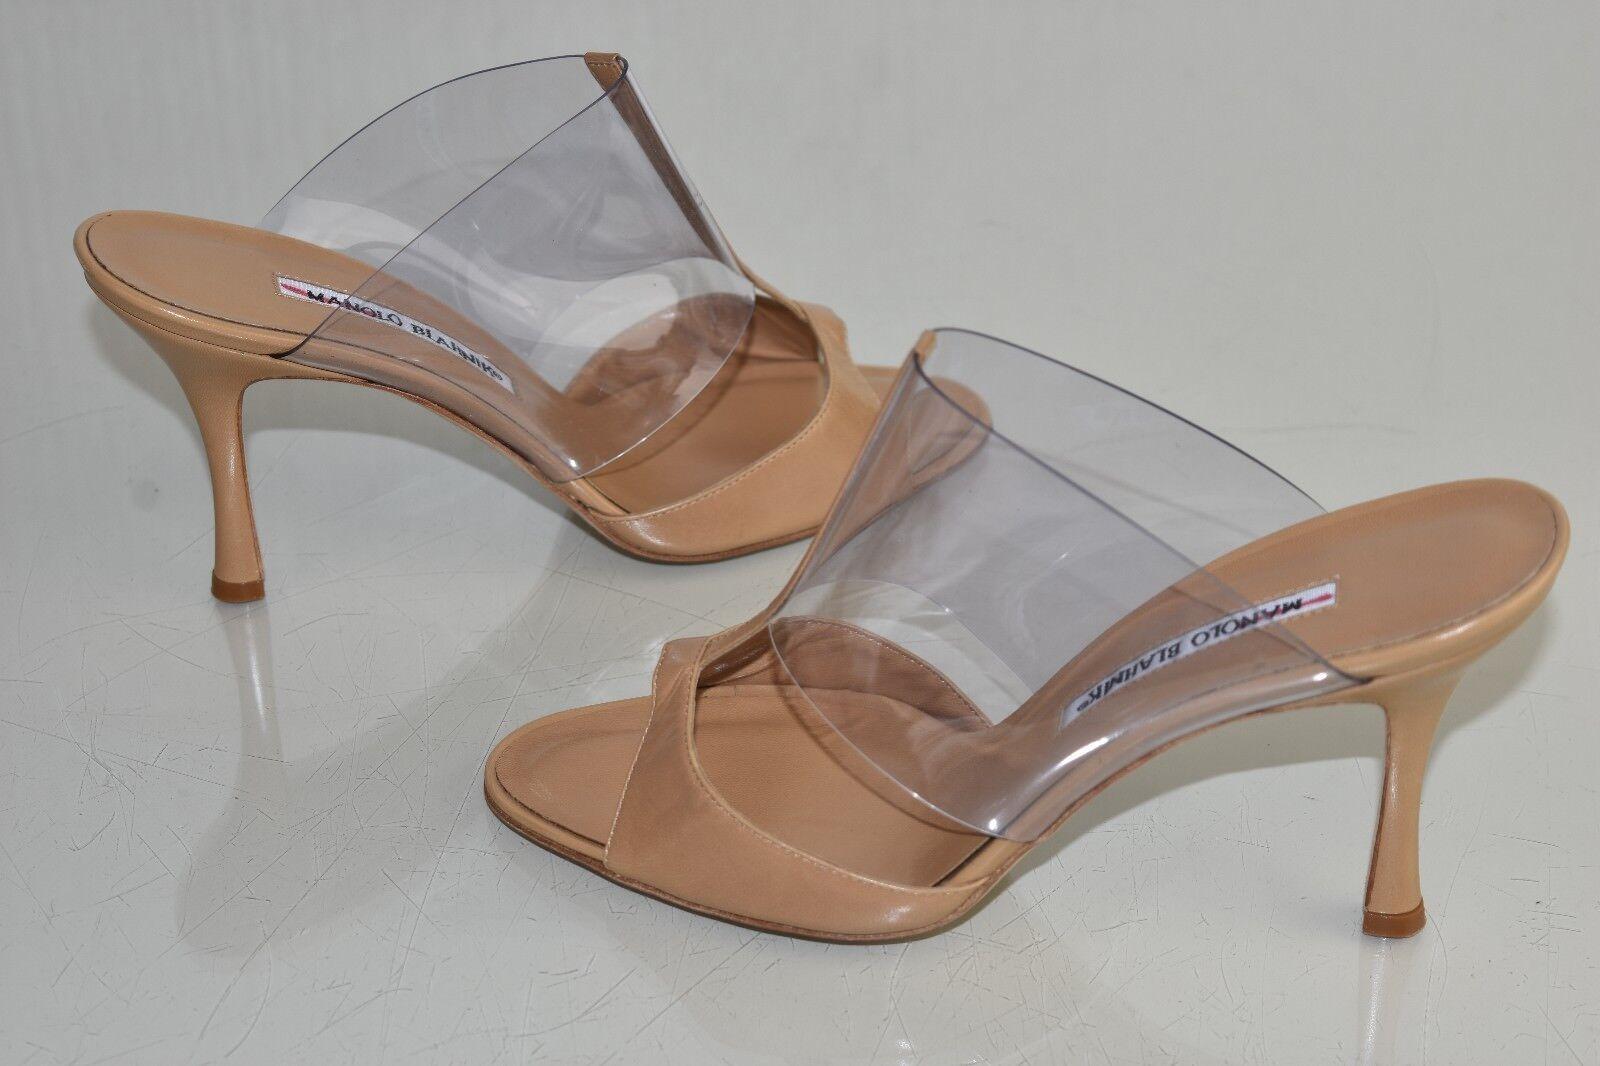 economico NEW Manolo Blahnik Blahnik Blahnik Sandals PVC Sandals Patent Leather Beige Marrone Slide scarpe 39  servizio onesto